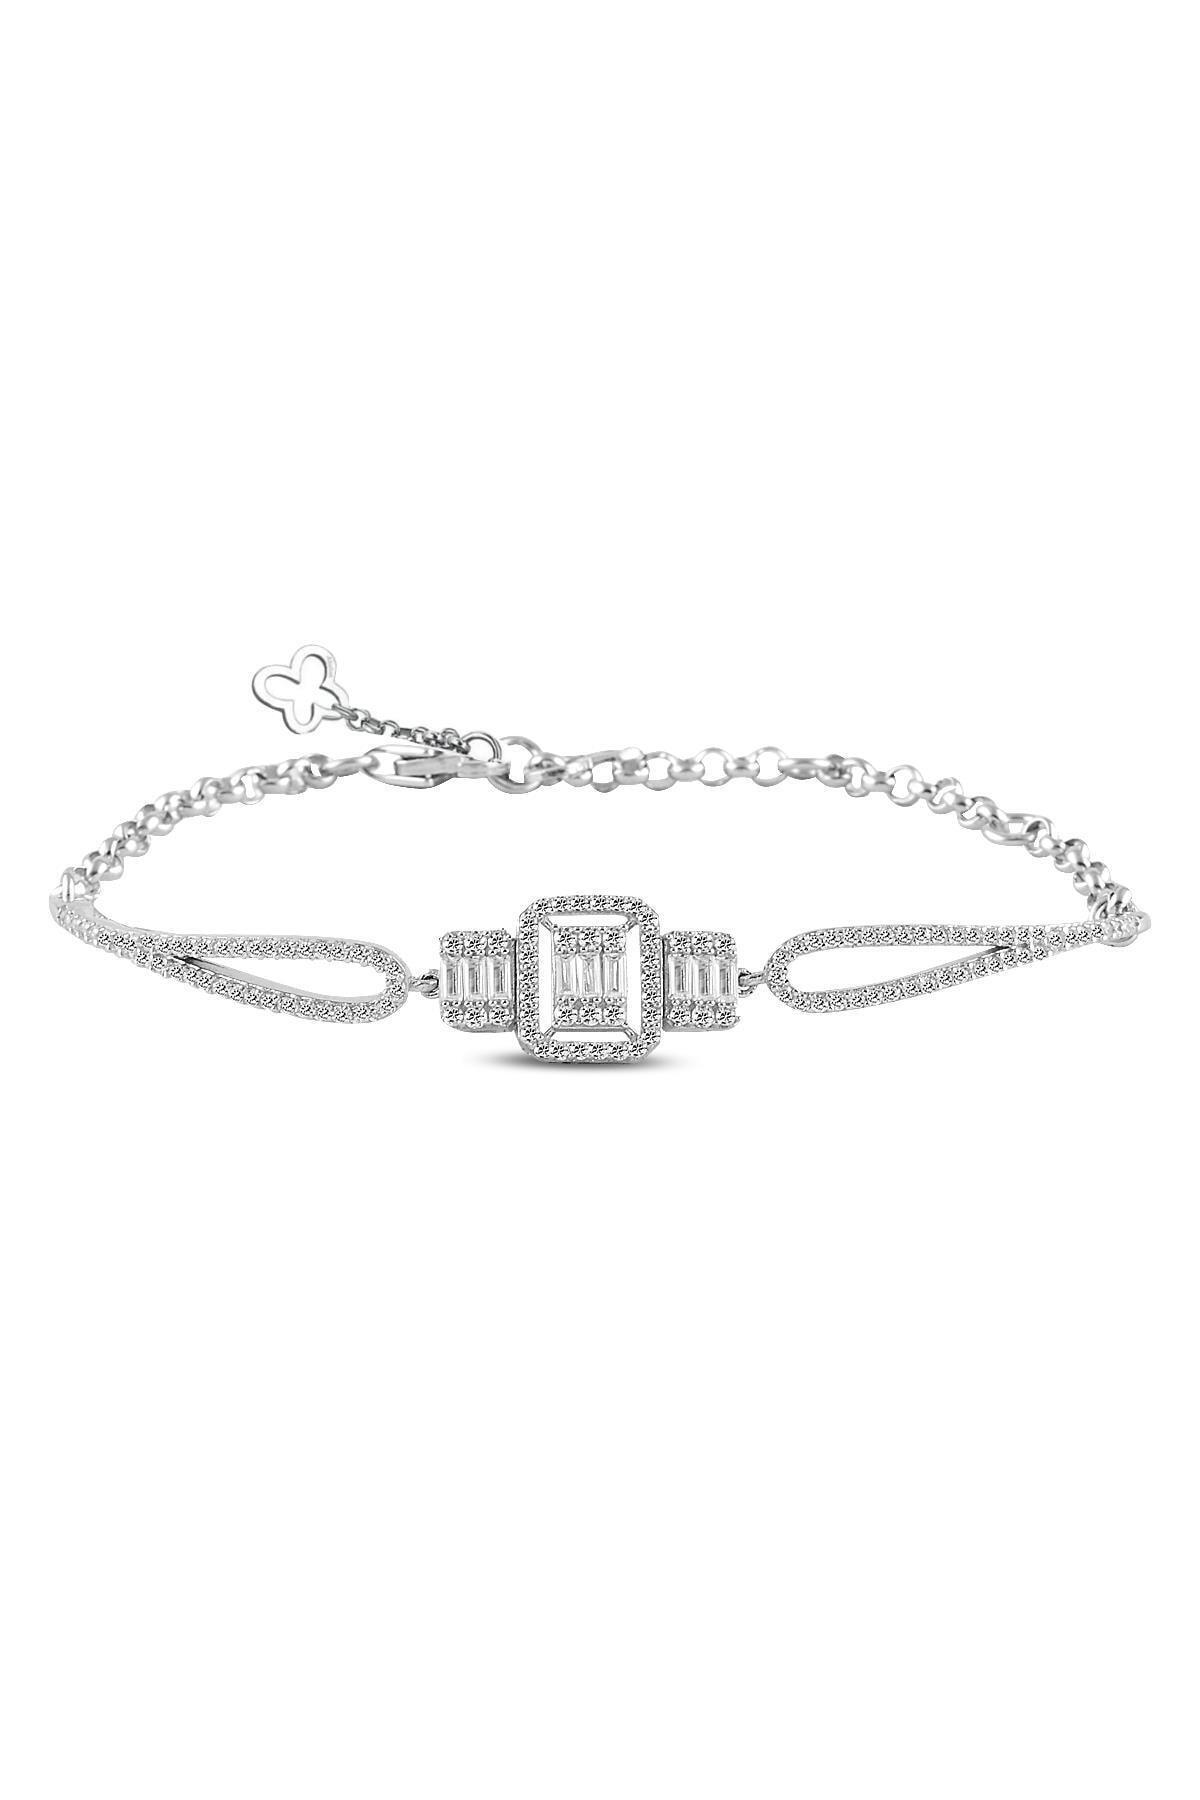 Söğütlü Silver Gümüş Rodyumlu Baget Taşlı Bilezik 1